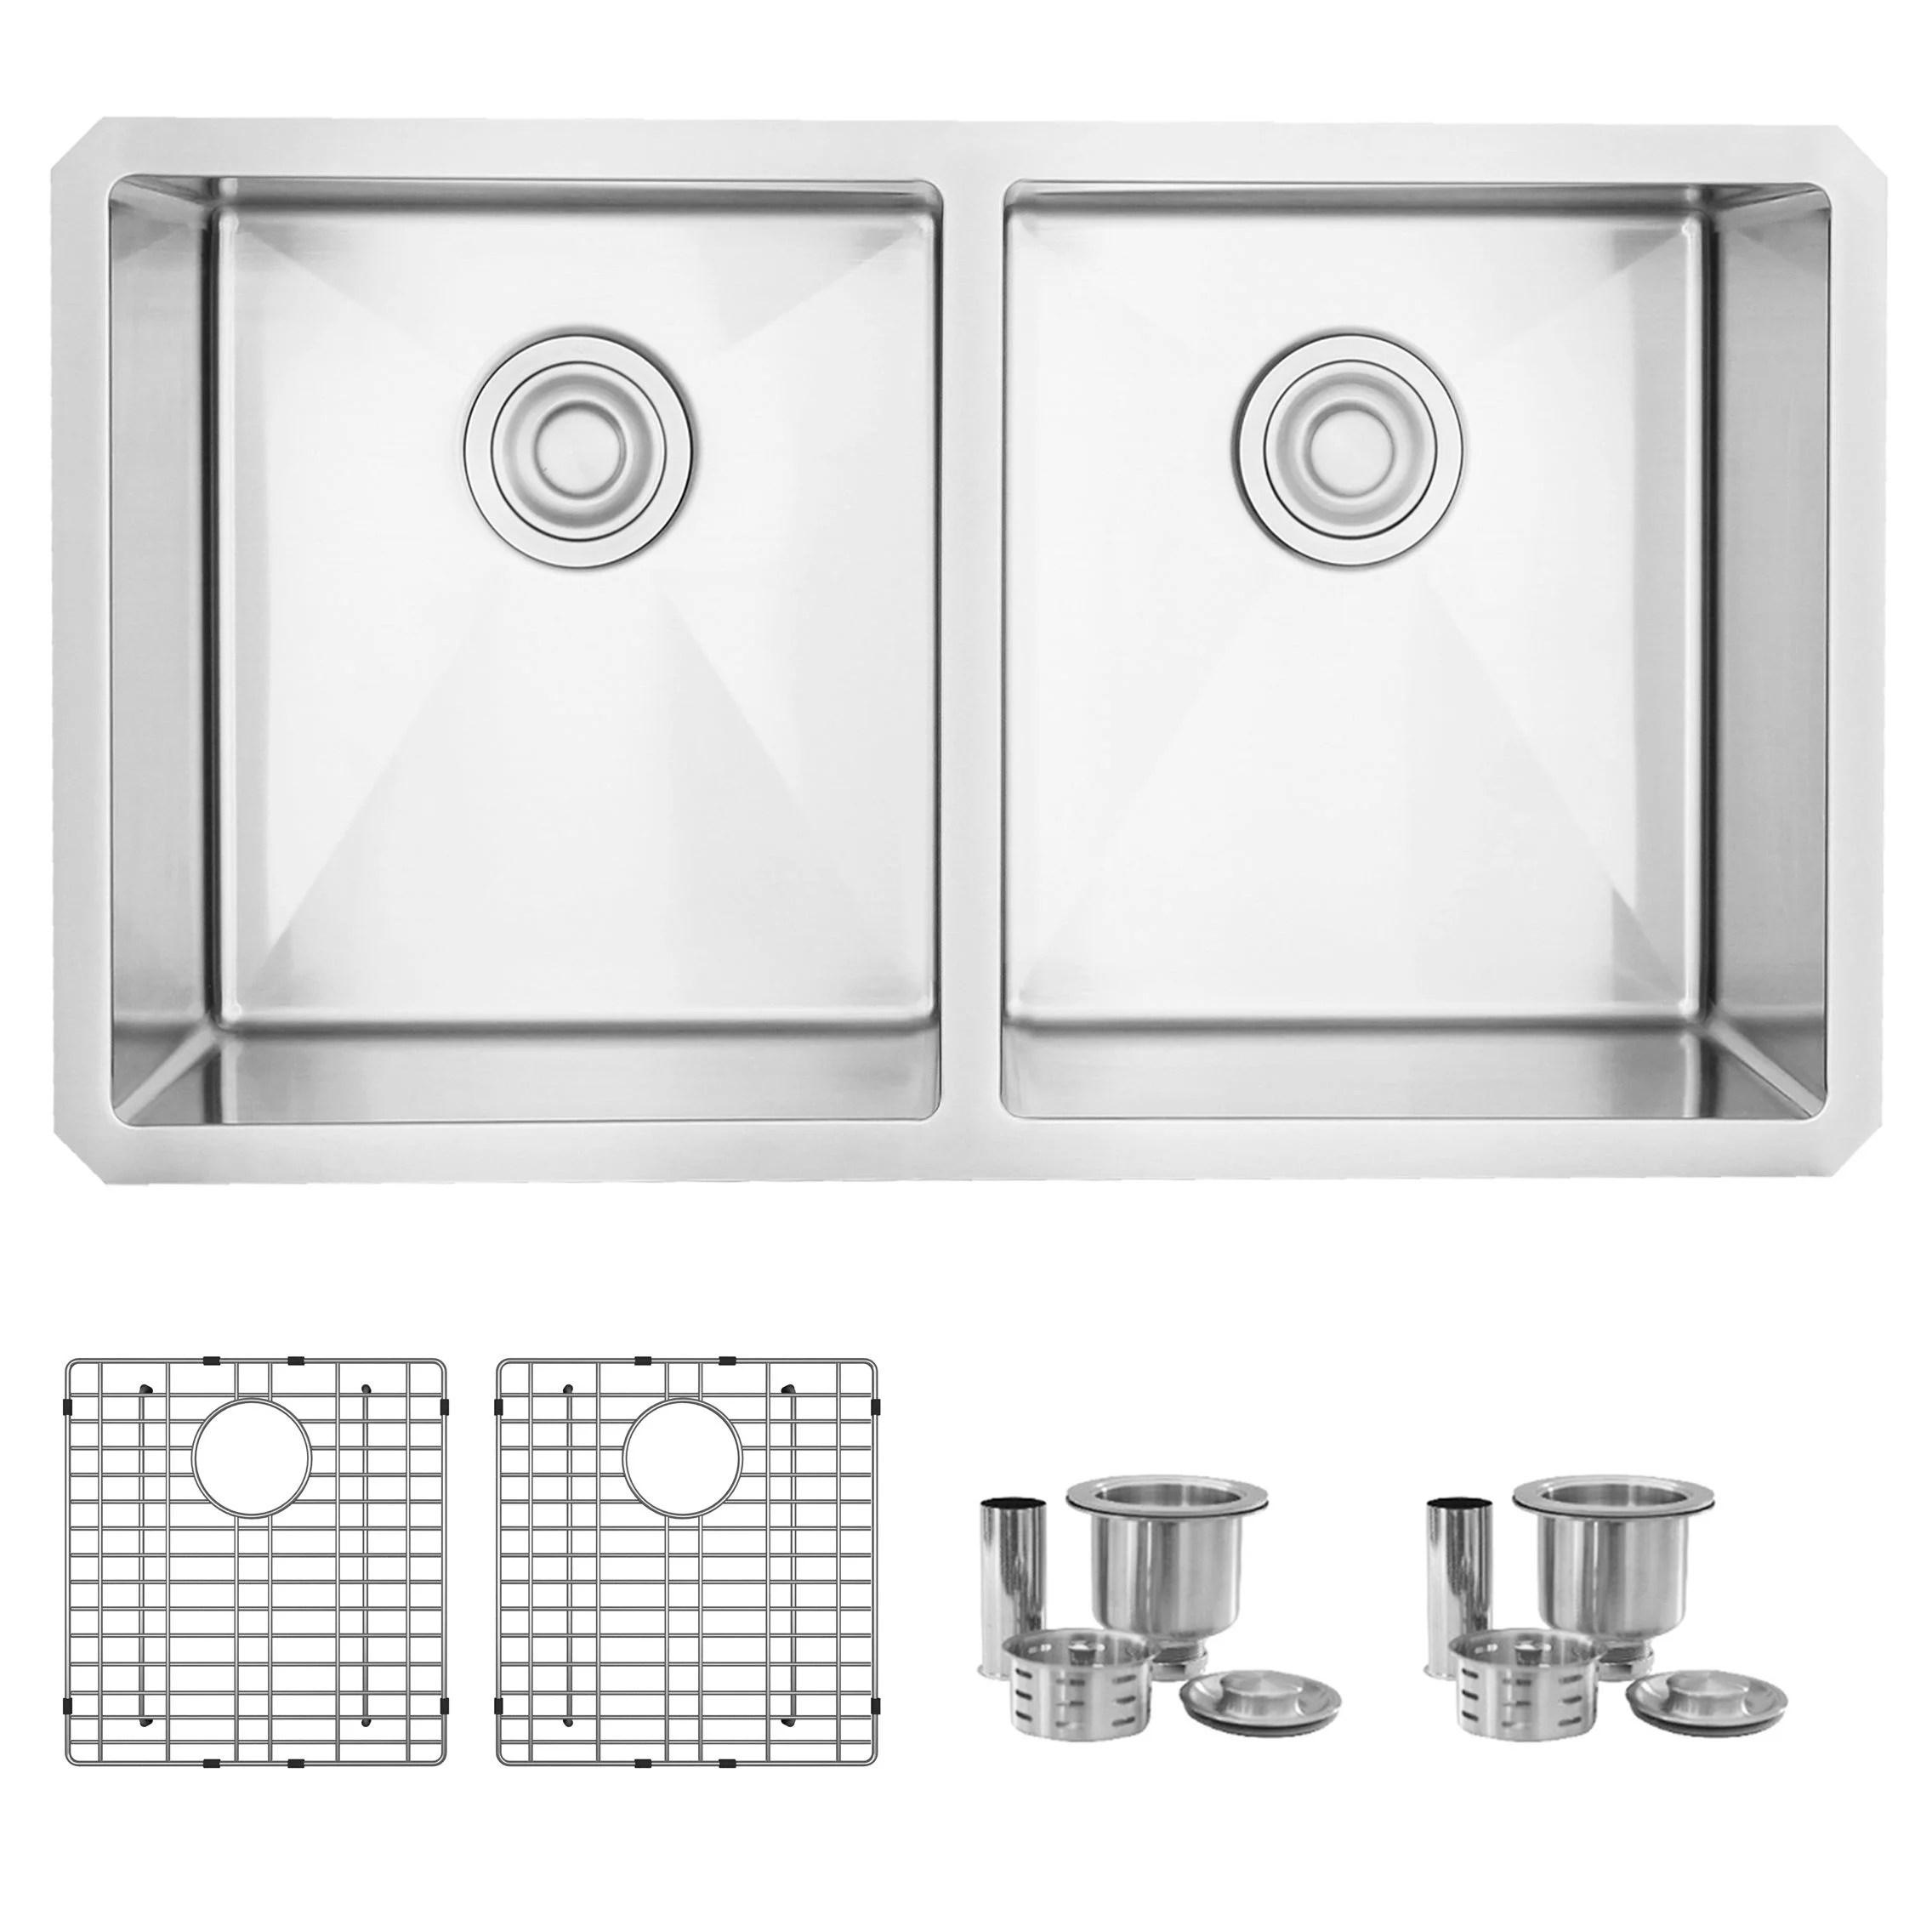 stylish 32 inch double bowl undermount stainless steel kitchen sink